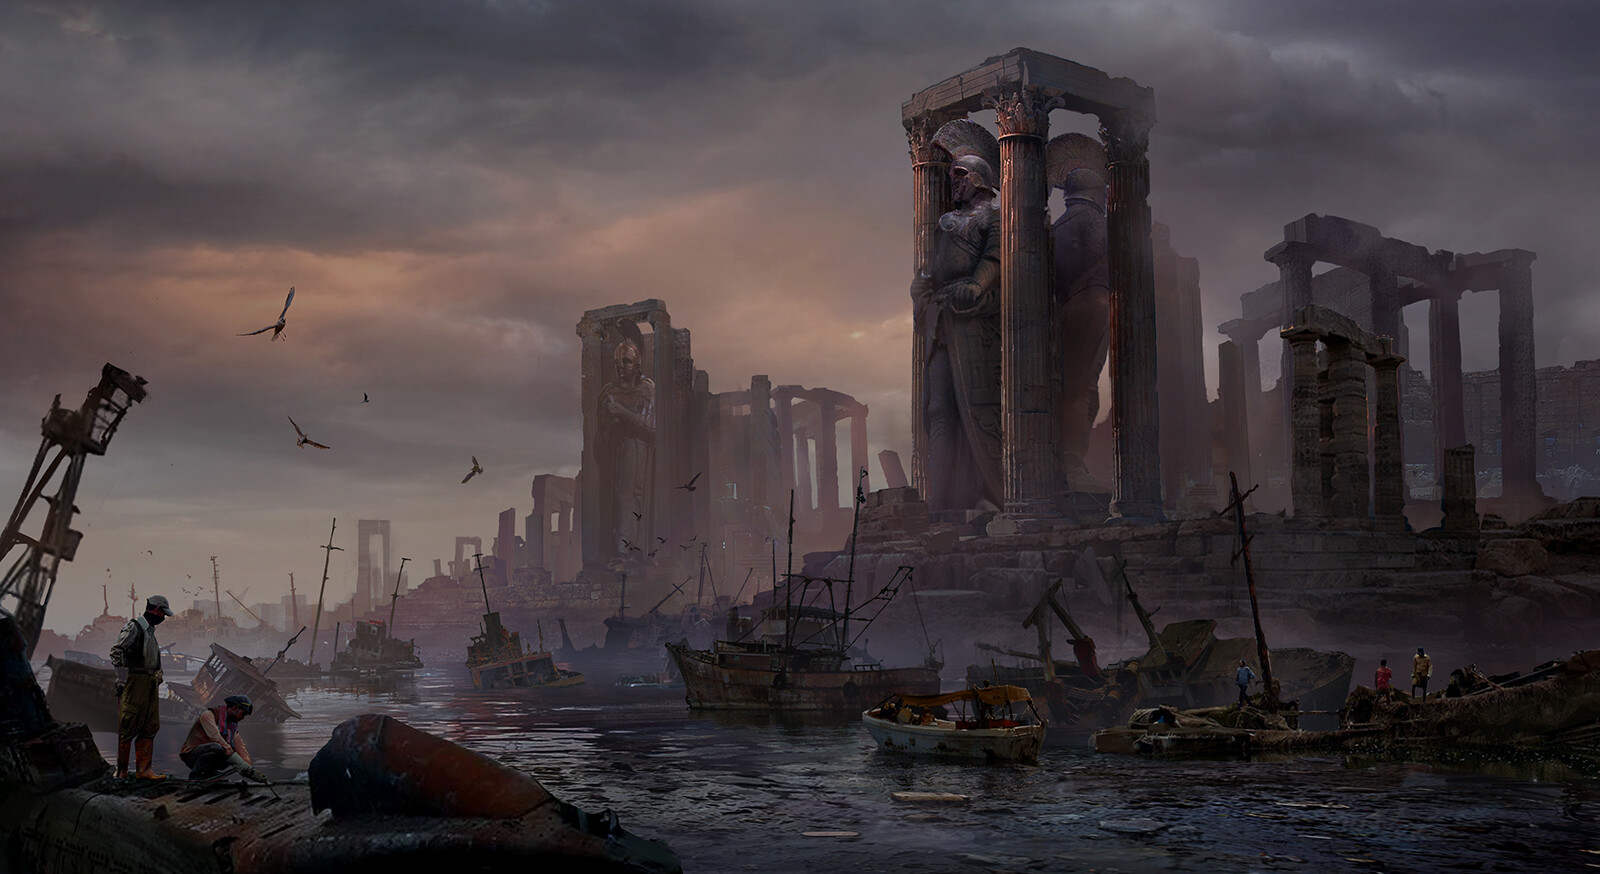 Alex ichim ancient harbour